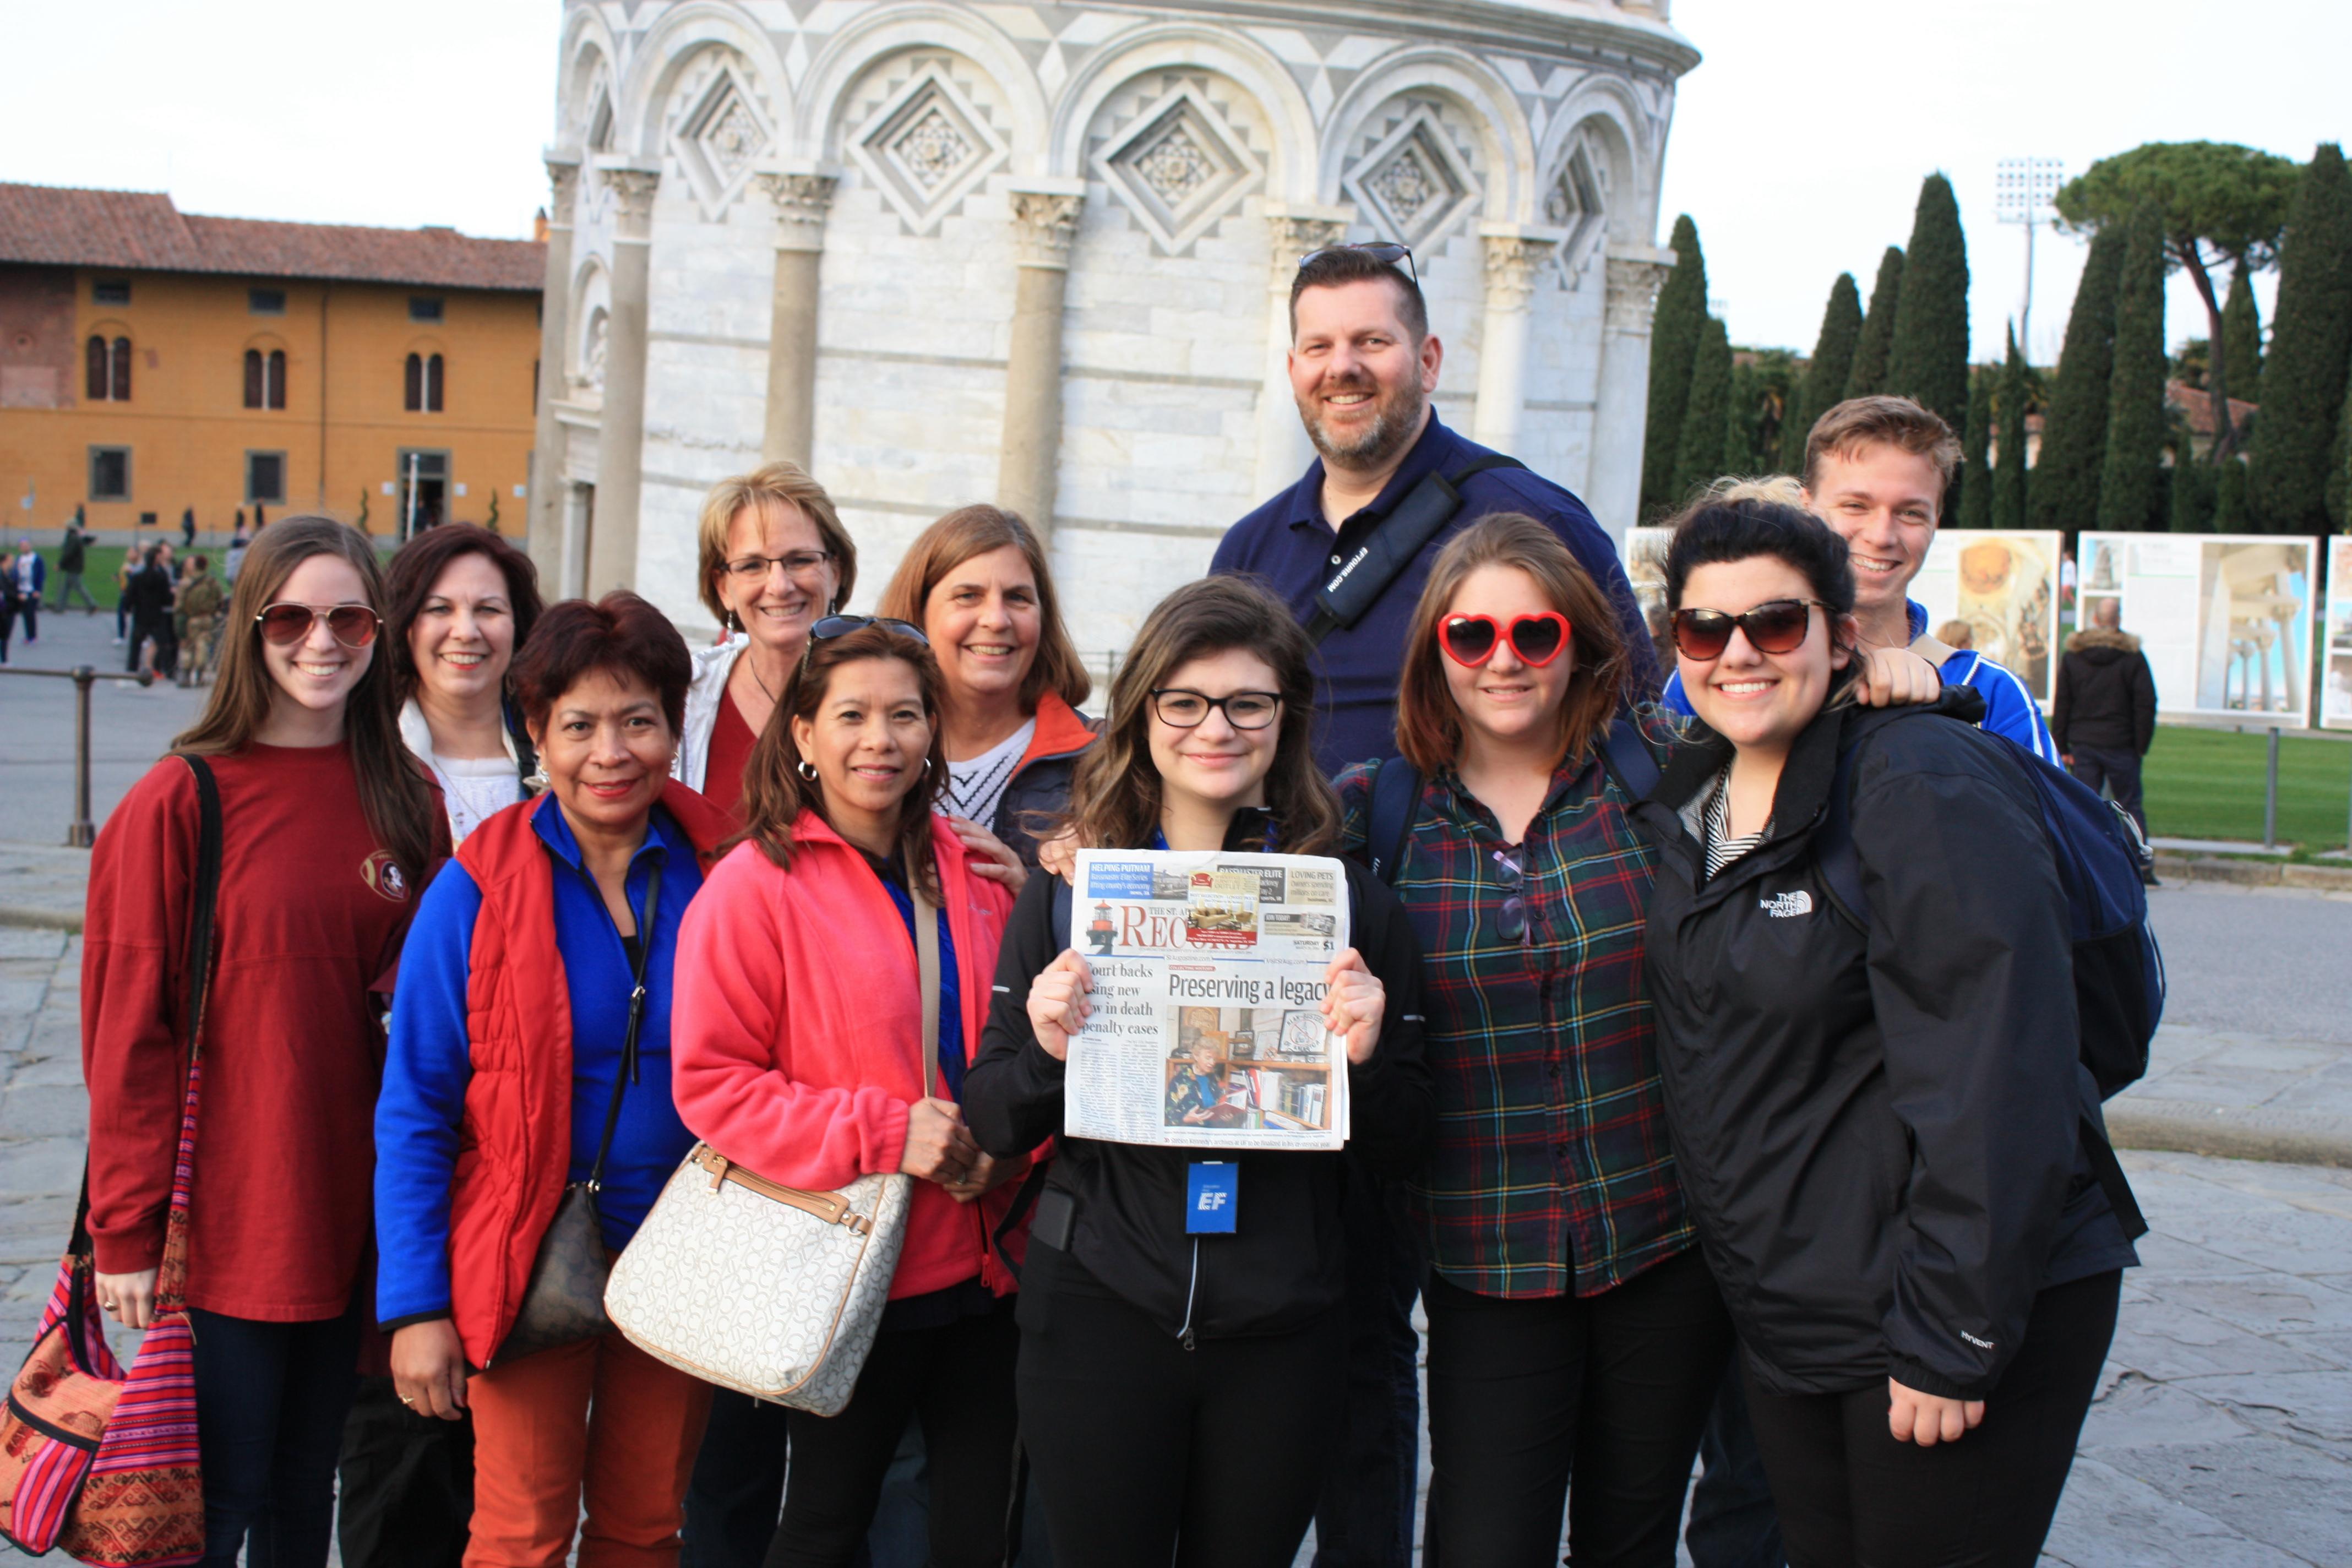 AICE in Pisa, Italy